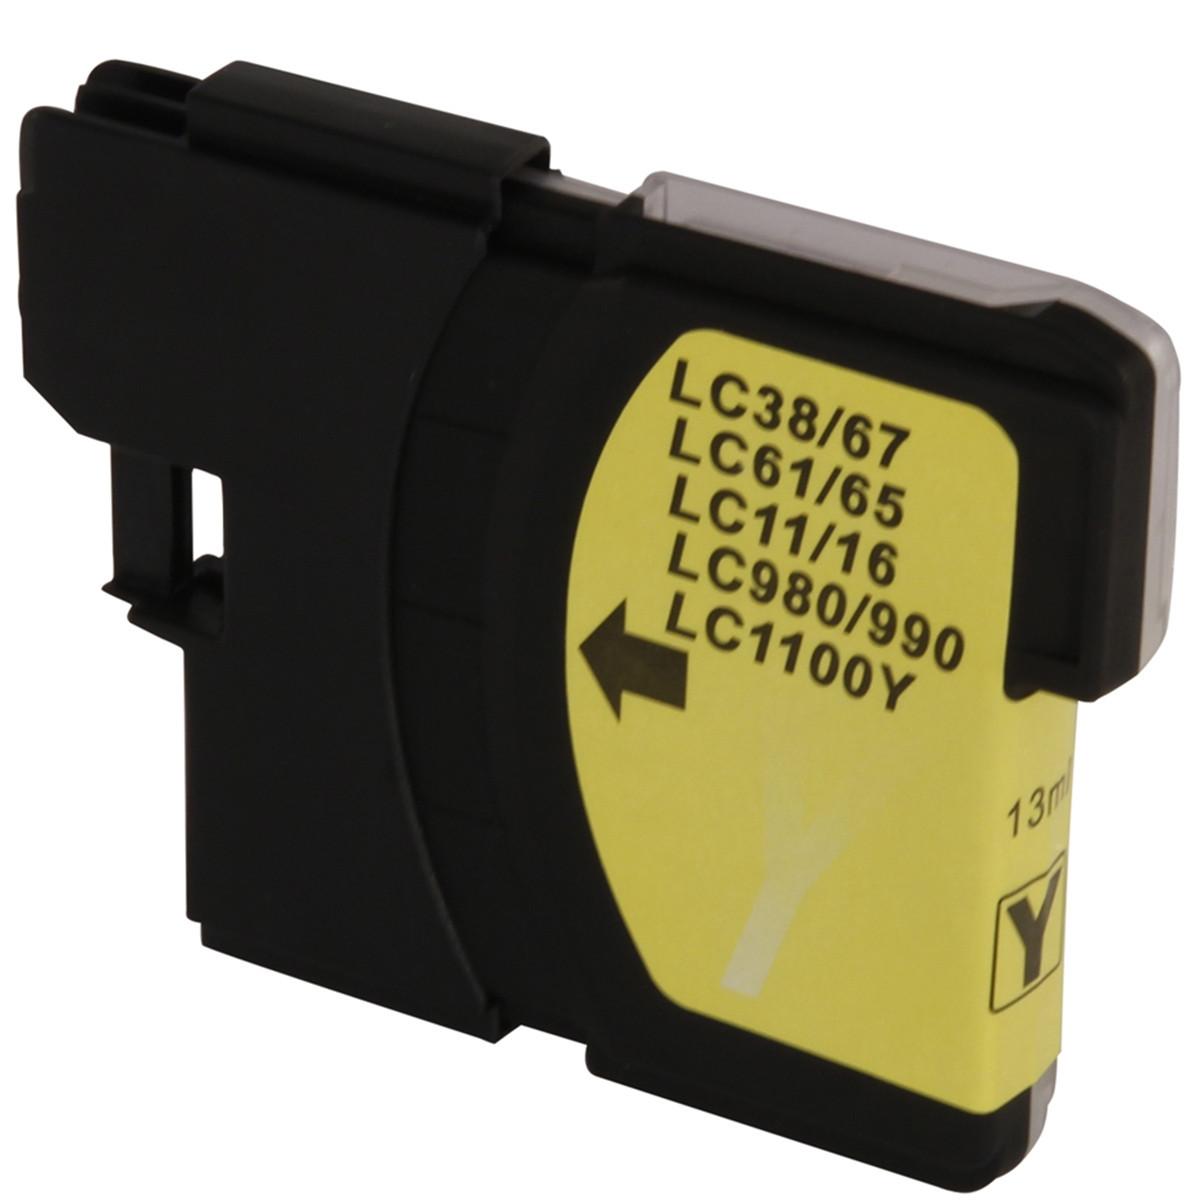 Cartucho de Tinta Compatível com Brother LC-61Y LC-61 Amarelo   MFC-990CW MFC-490CW DCP-585CW 13ml